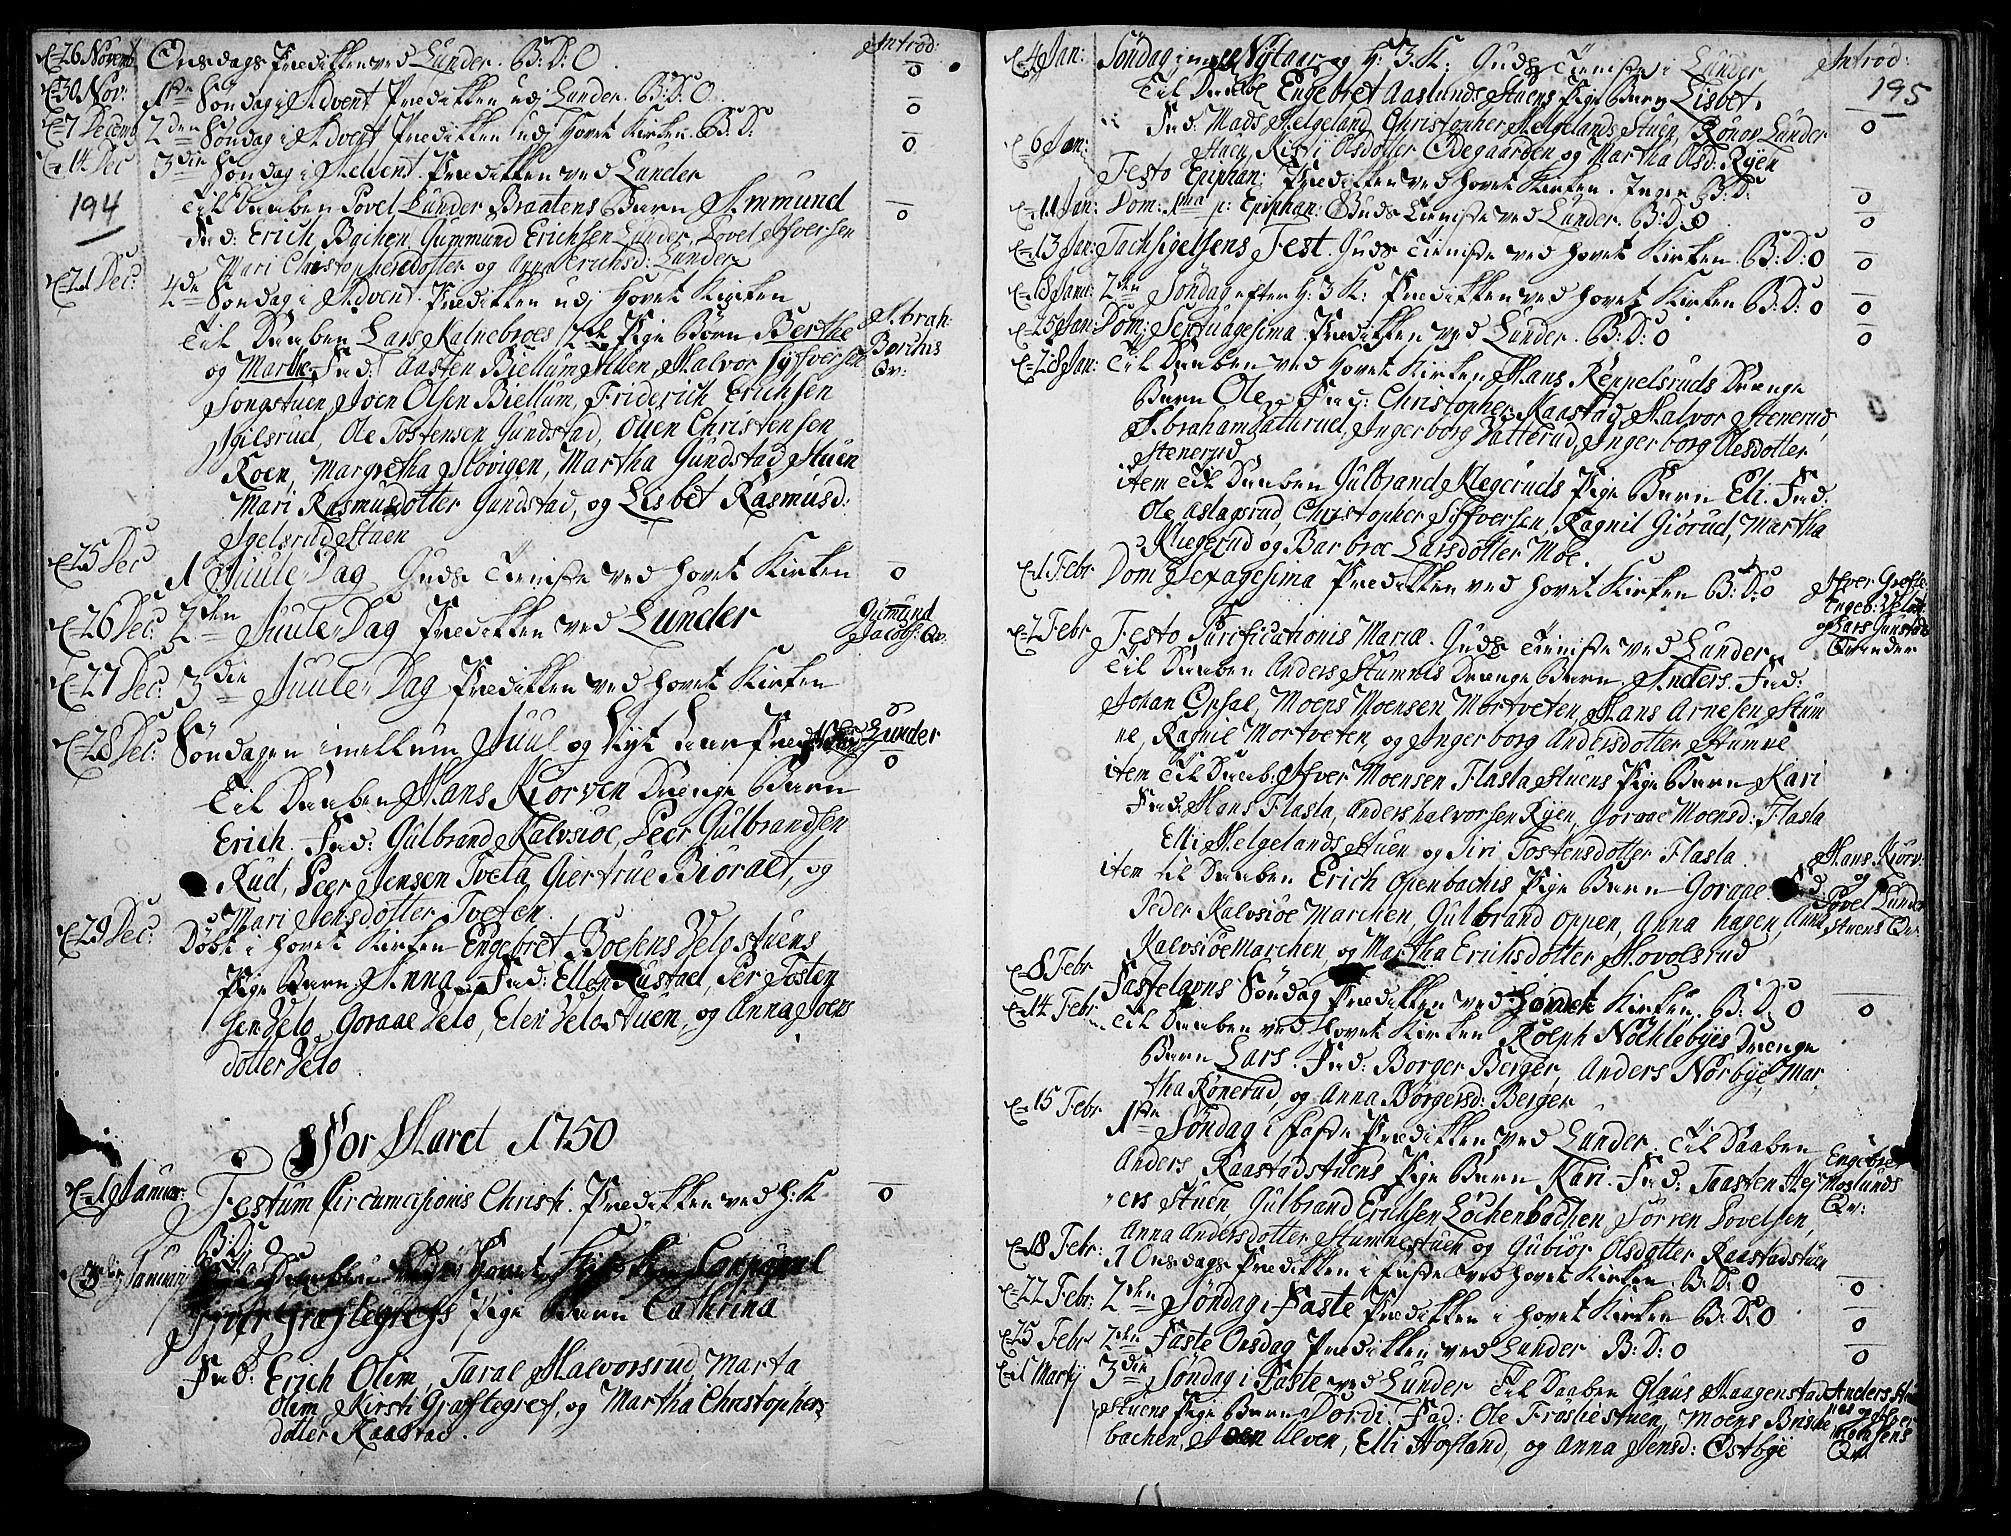 SAH, Jevnaker prestekontor, Ministerialbok nr. 2, 1725-1751, s. 194-195